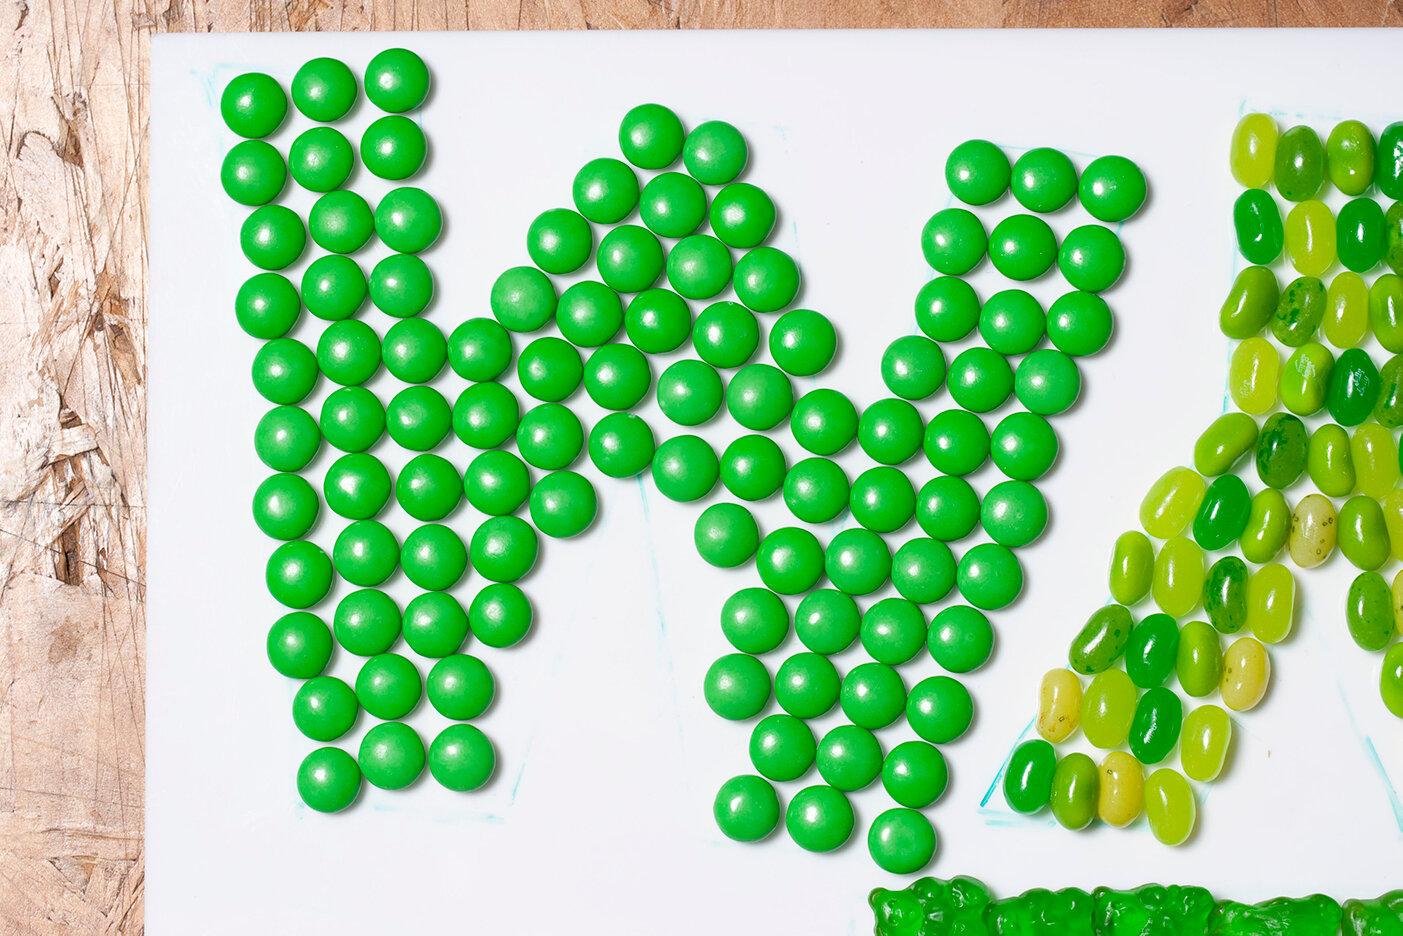 782.cover.candy.JR9.jpg